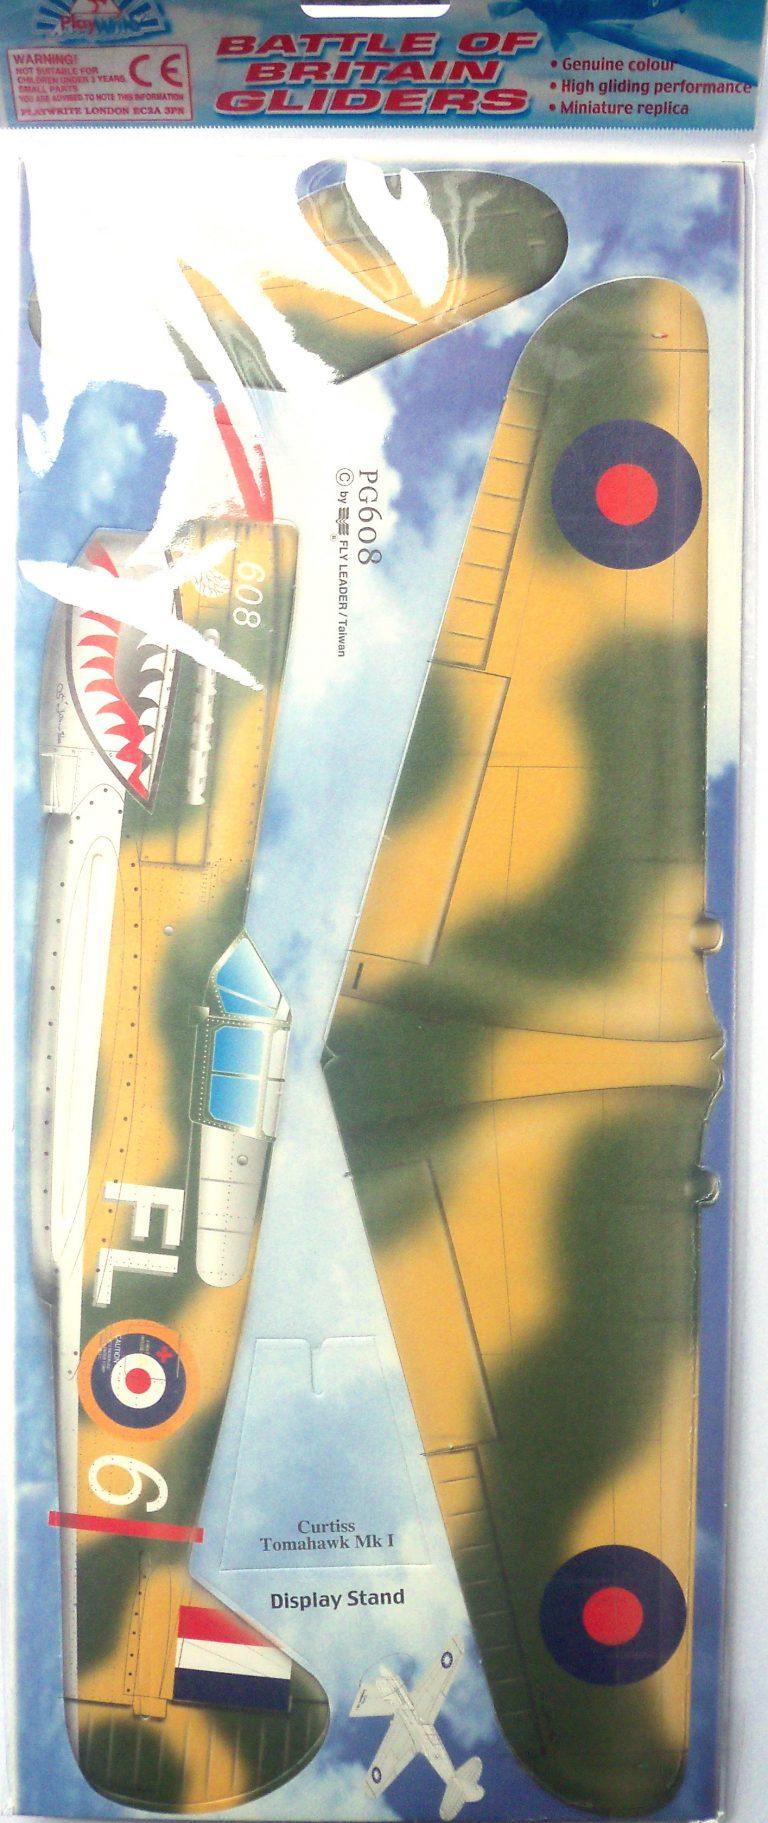 Battle of Britain Gliders-0